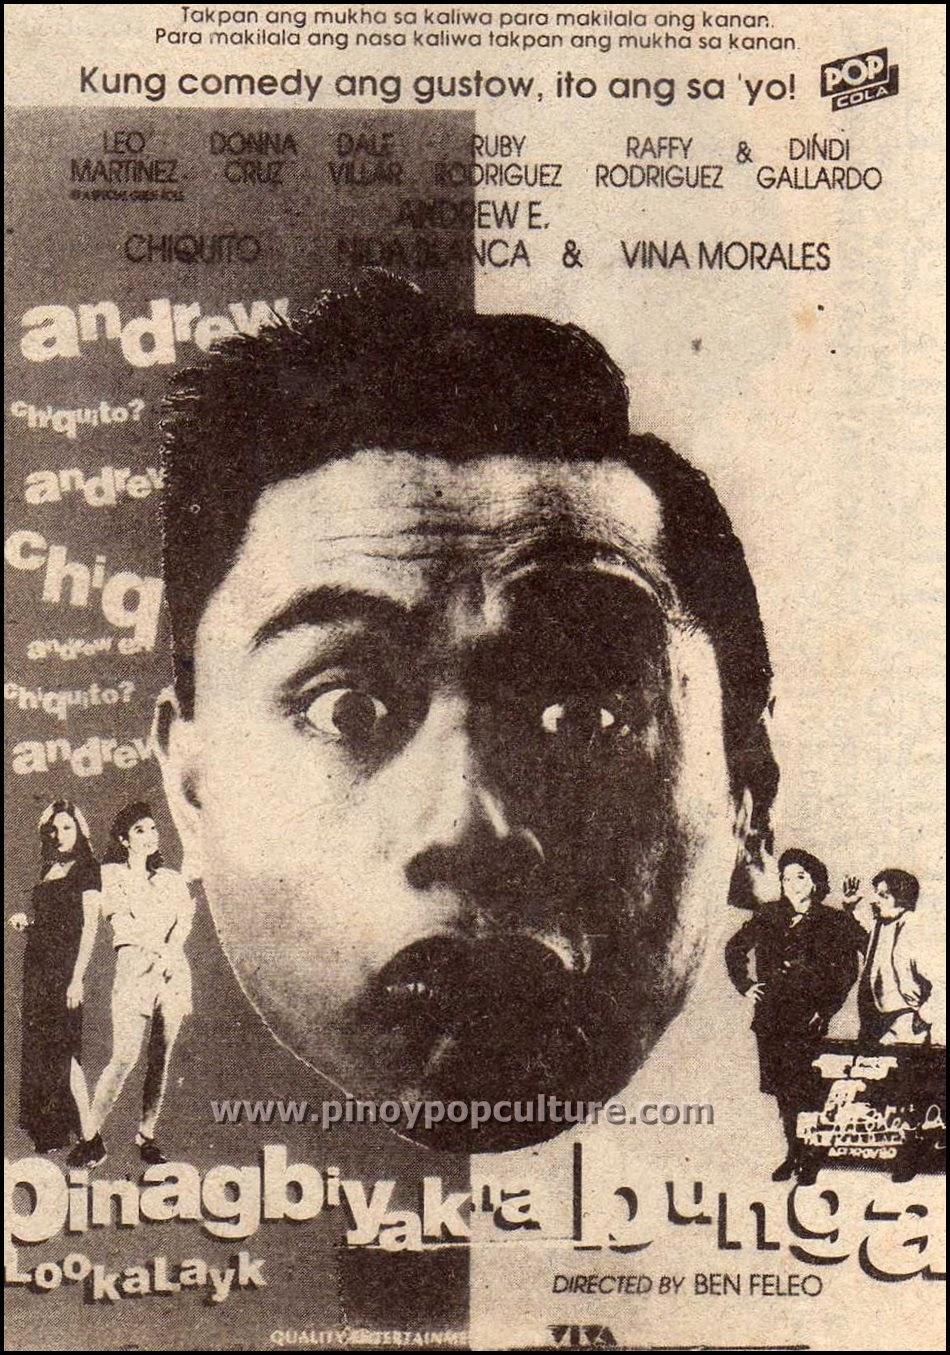 Pinagbiyak na Bunga, Lookalayk, Andrew E., Chiquito, Viva Films, movies